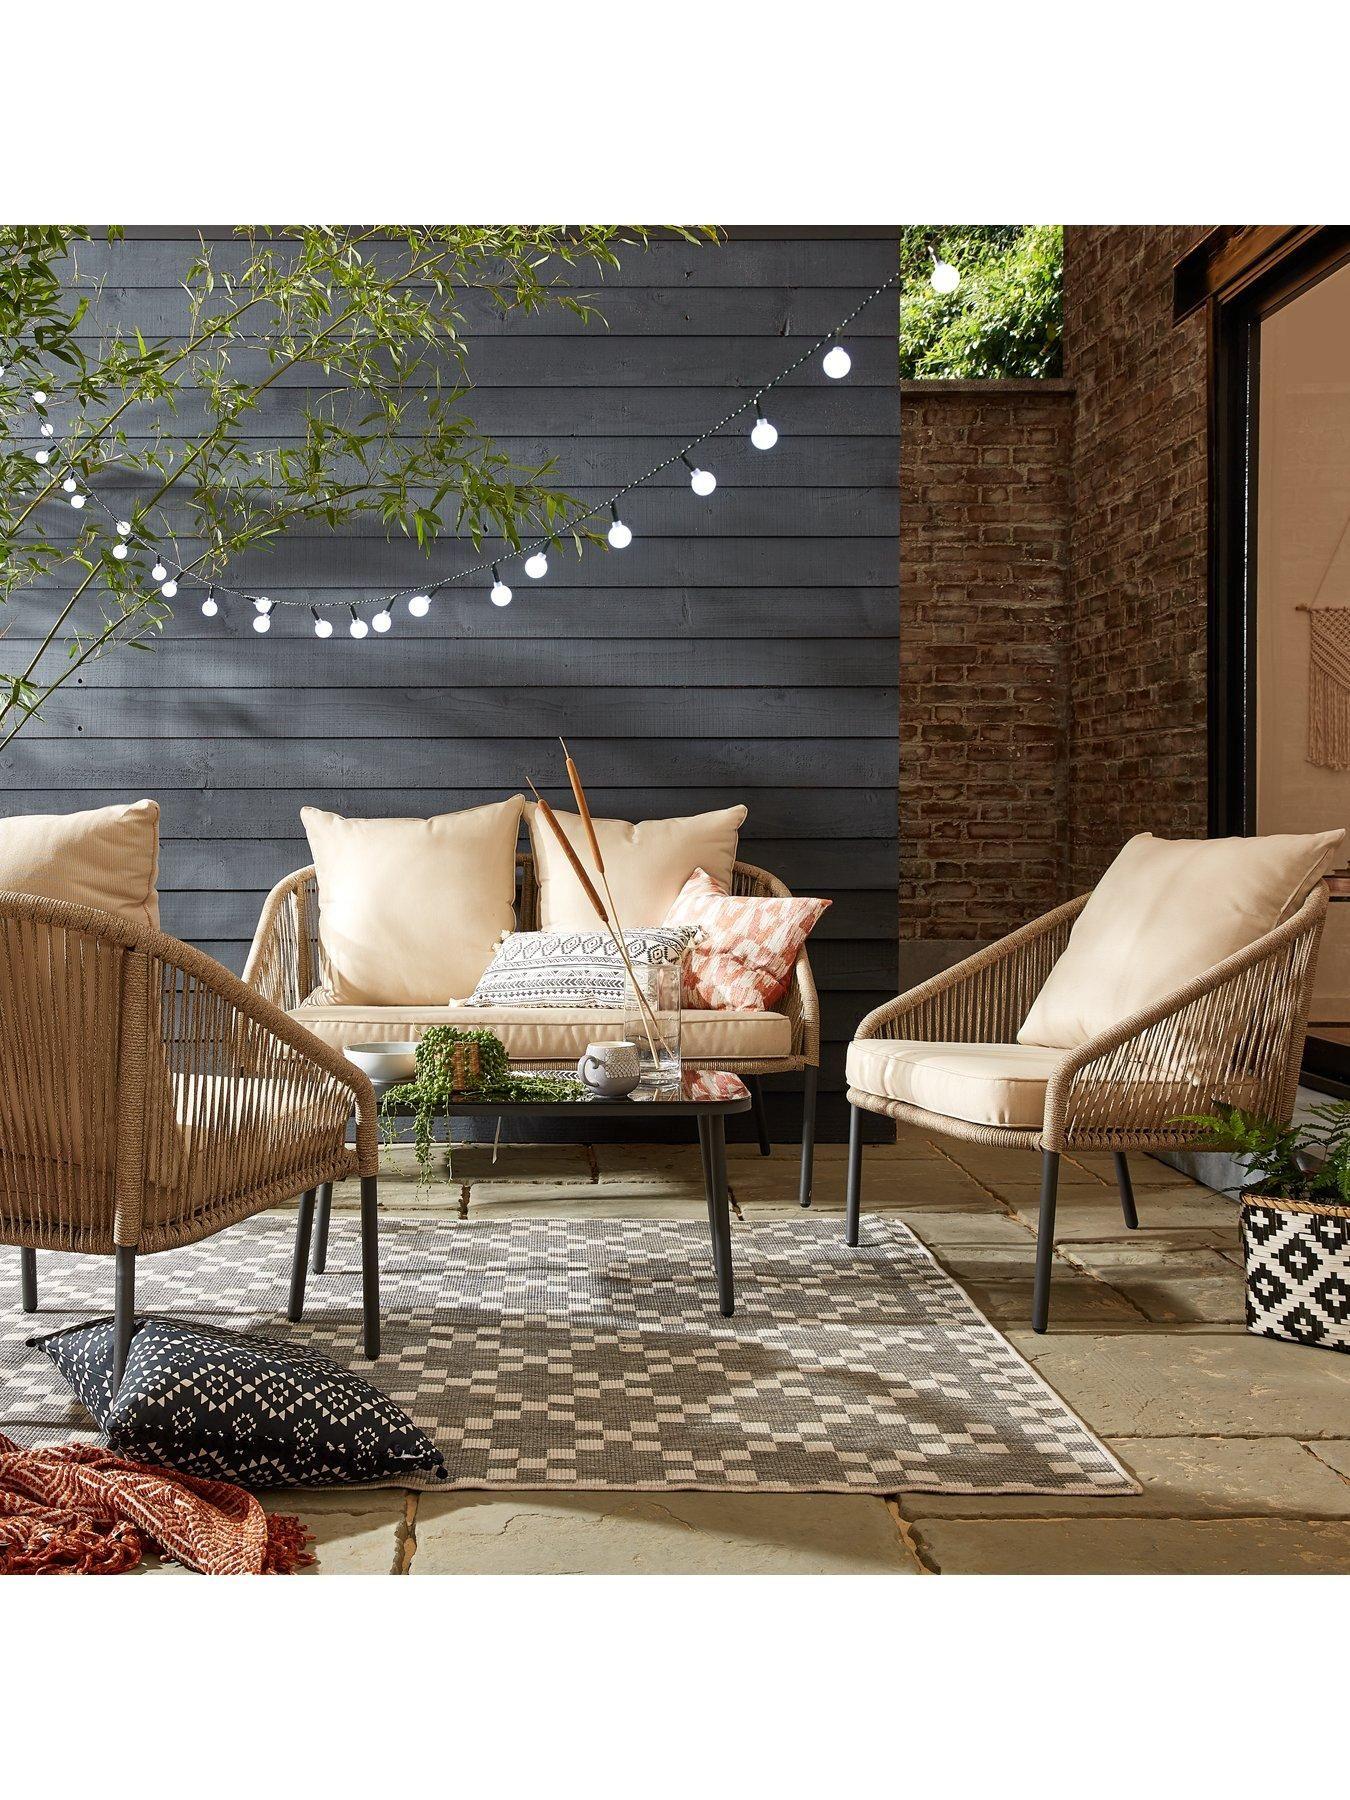 garden furniture sets on tvs latest televisions very co uk garden furniture sets garden furniture uk garden furniture garden furniture sets